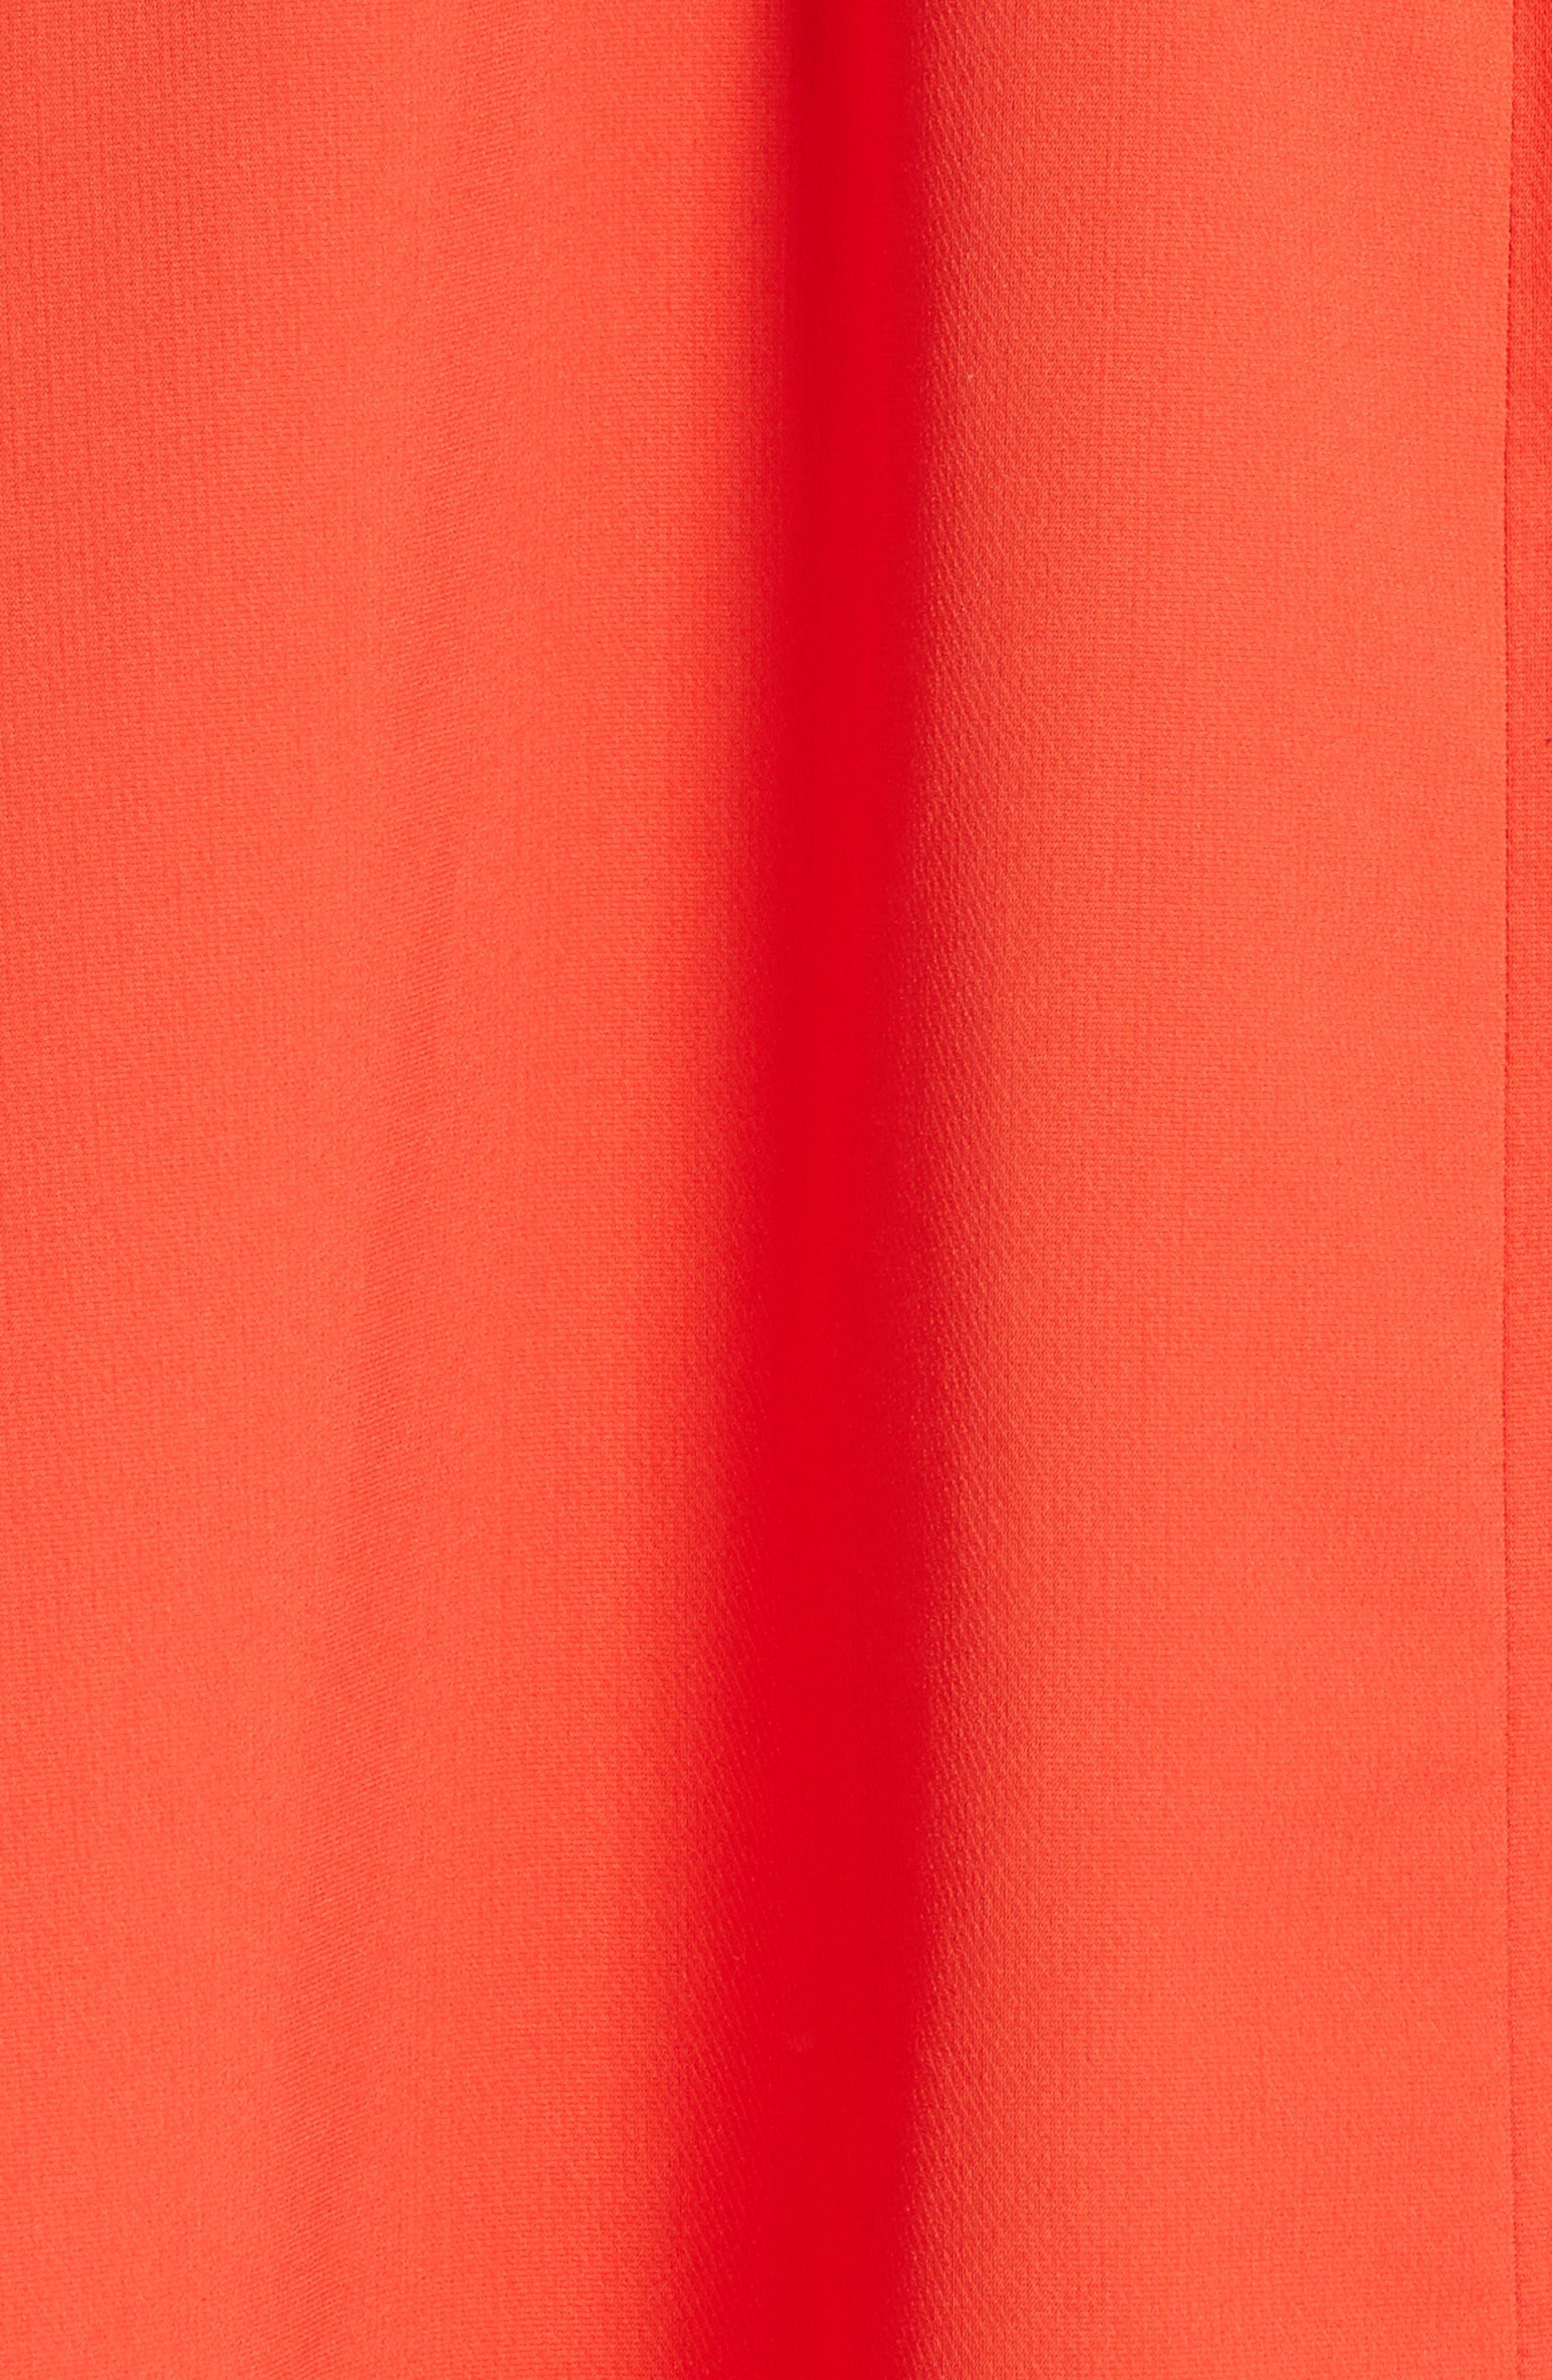 Belted Pocket Skirt,                             Alternate thumbnail 5, color,                             610